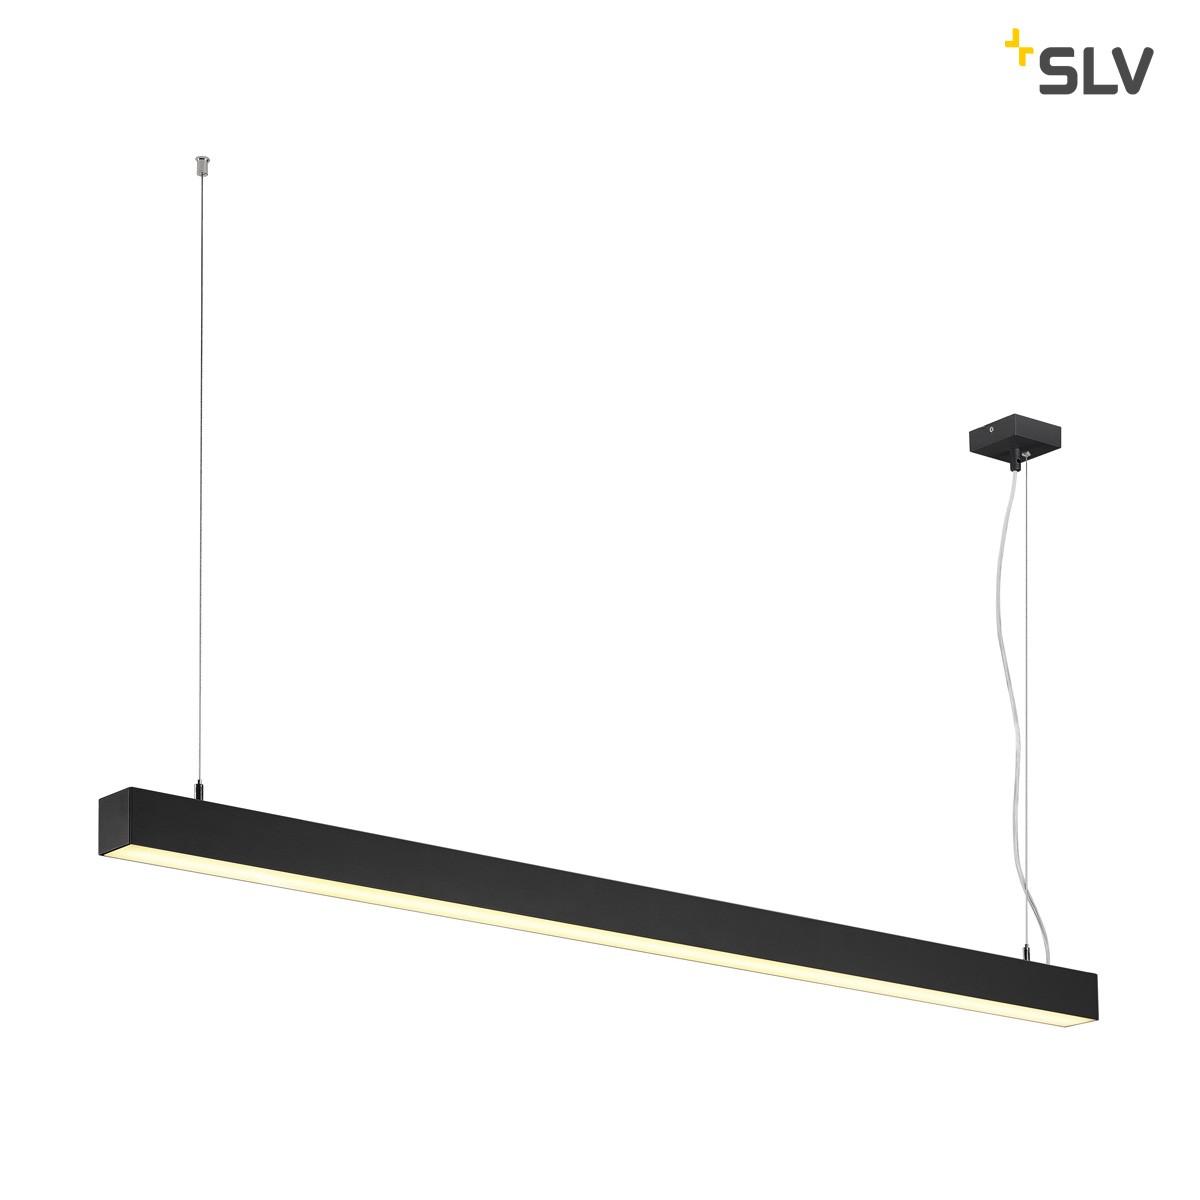 SLV Q-Line Single Pendelleuchte, schwarz